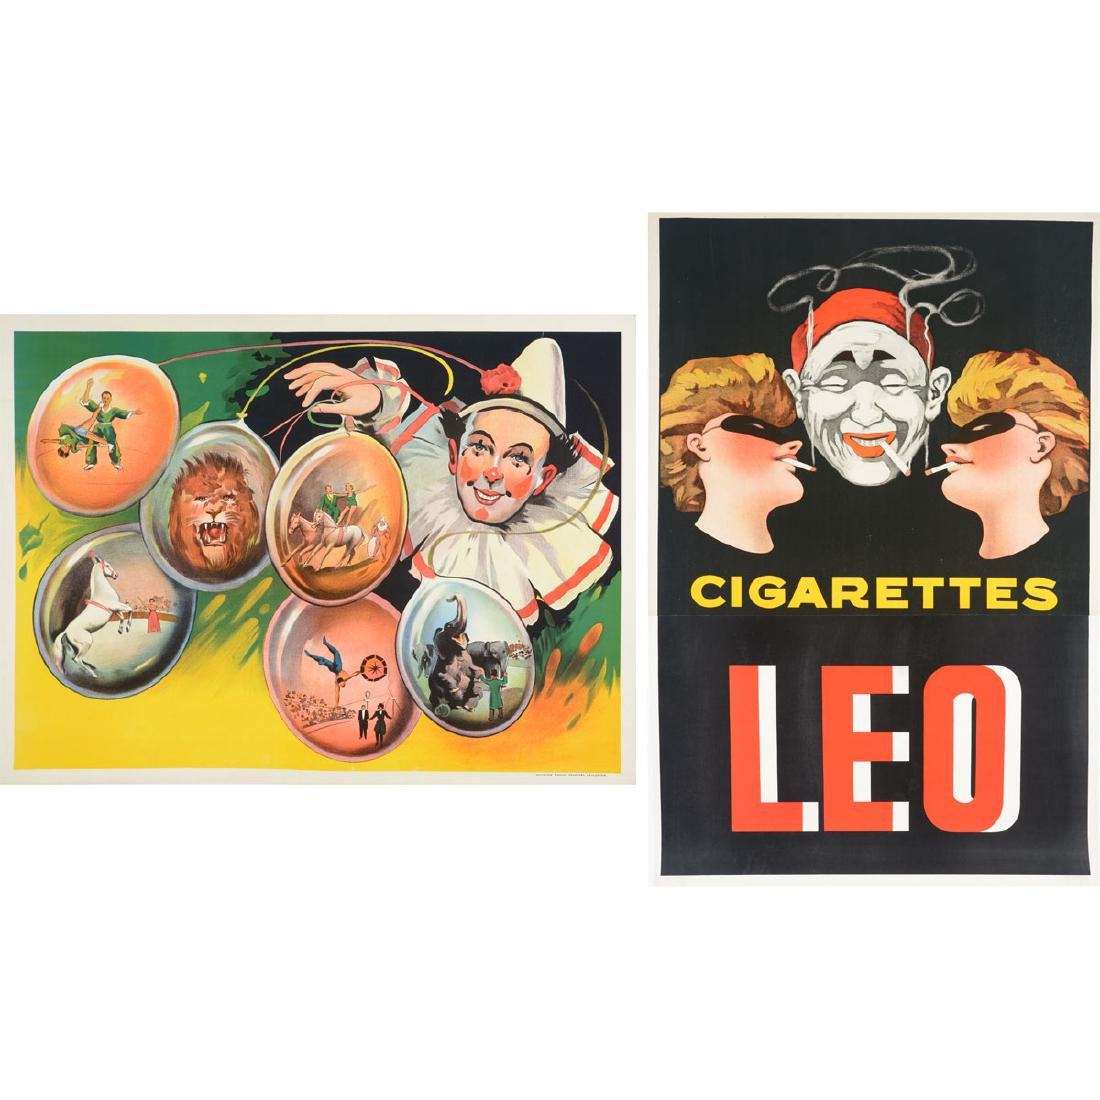 European lithograph posters Circus Stock & Cig. Leo